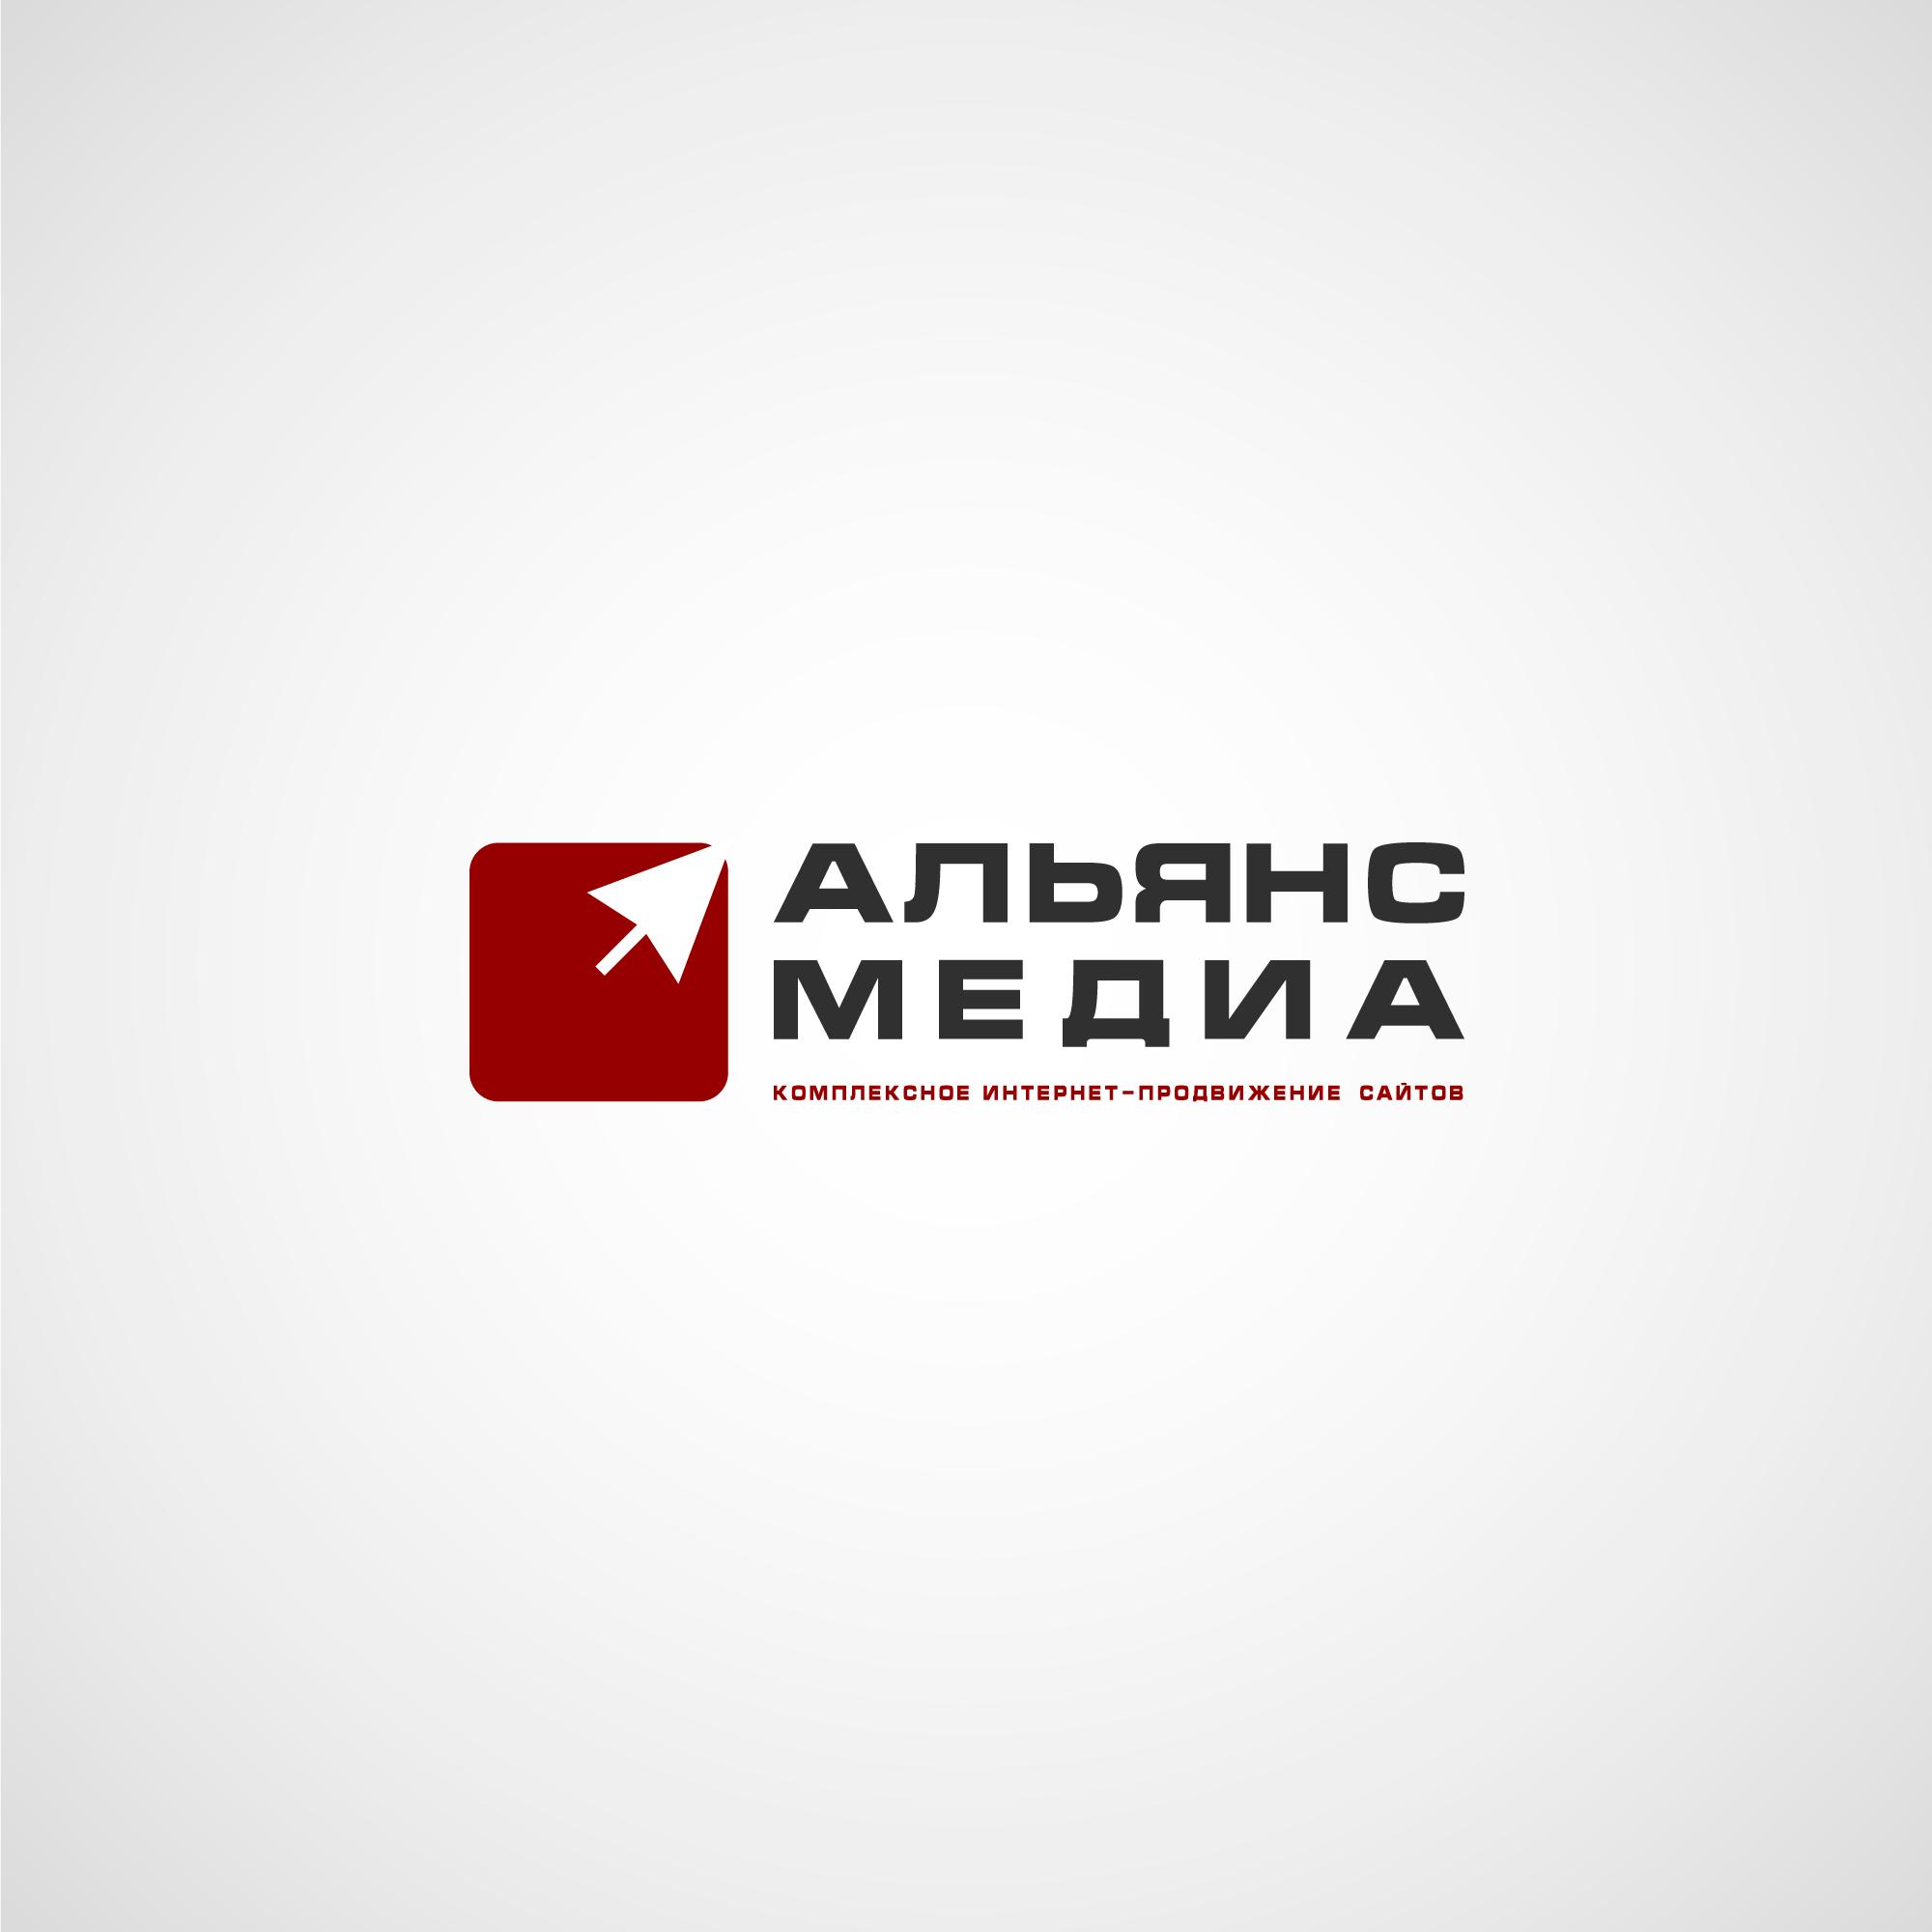 Создать логотип для компании фото f_1025aaa8ad23fde6.jpg